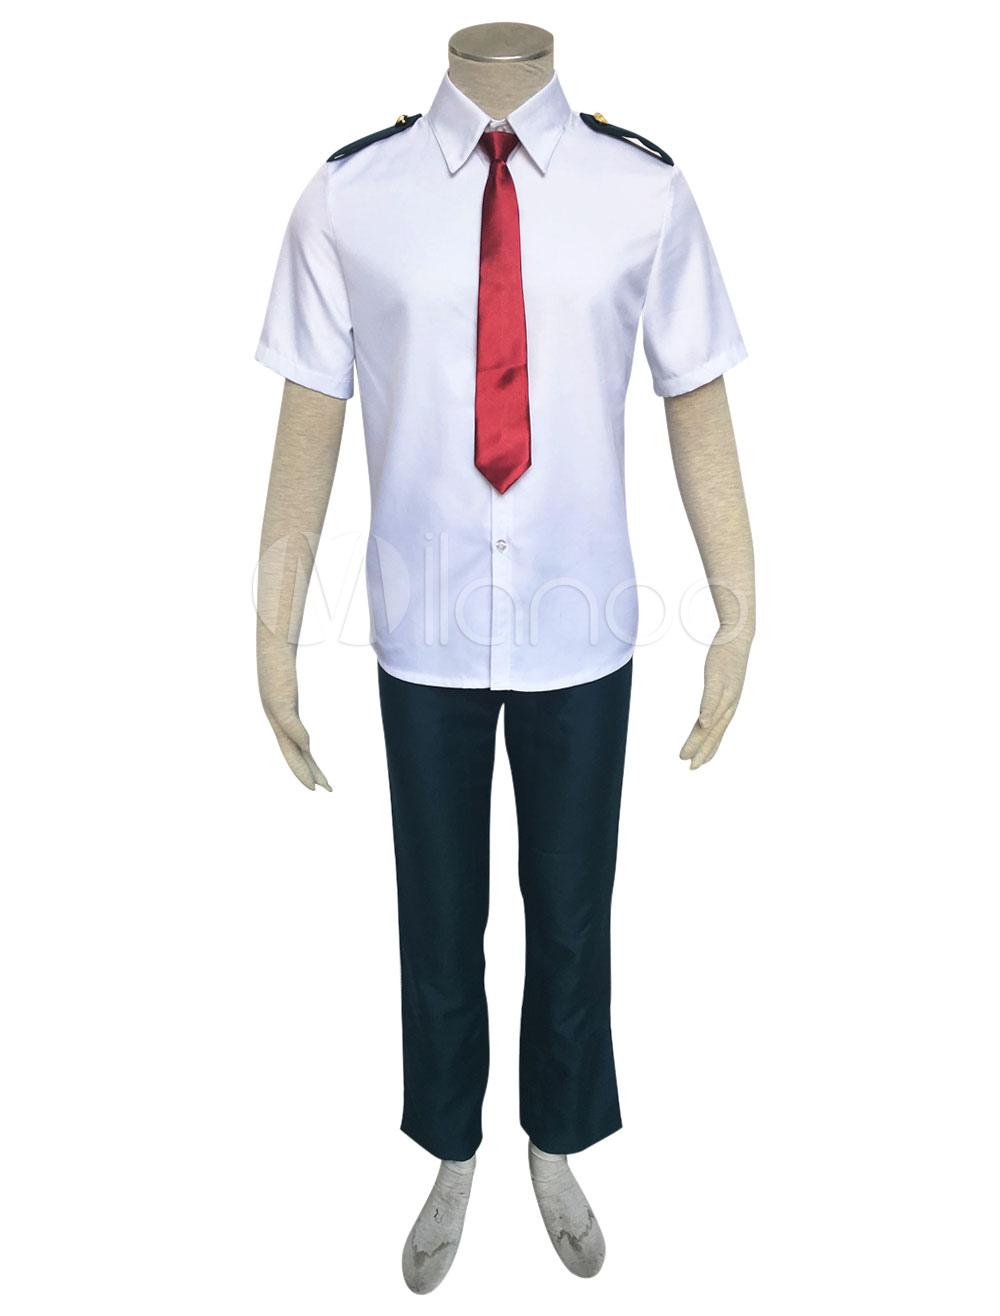 Deku Cosplay Boku No Hero Academy Midoriya Izuku Anime Bnha Cosplay Costume Summer School Uniform